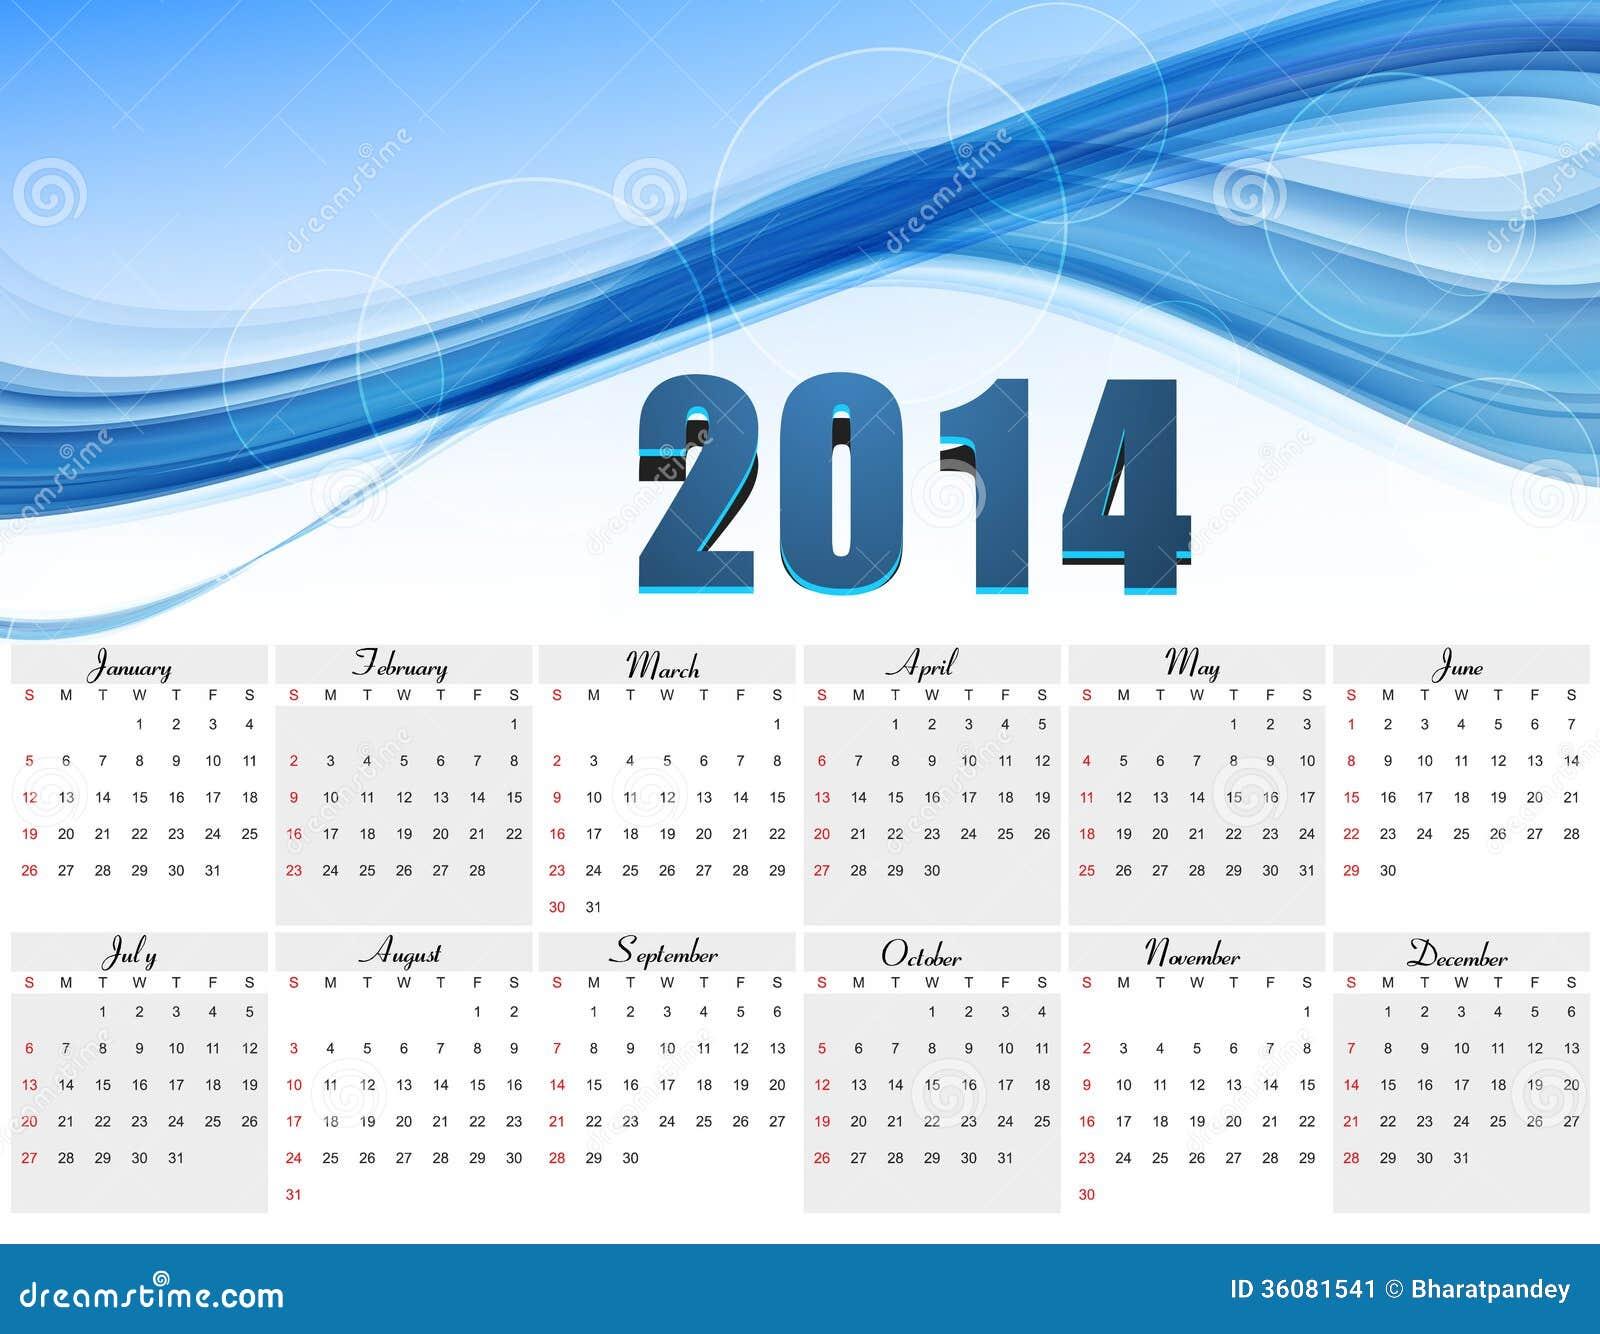 vector design blue colorful wave calendar 2014 stock vector image 36081541